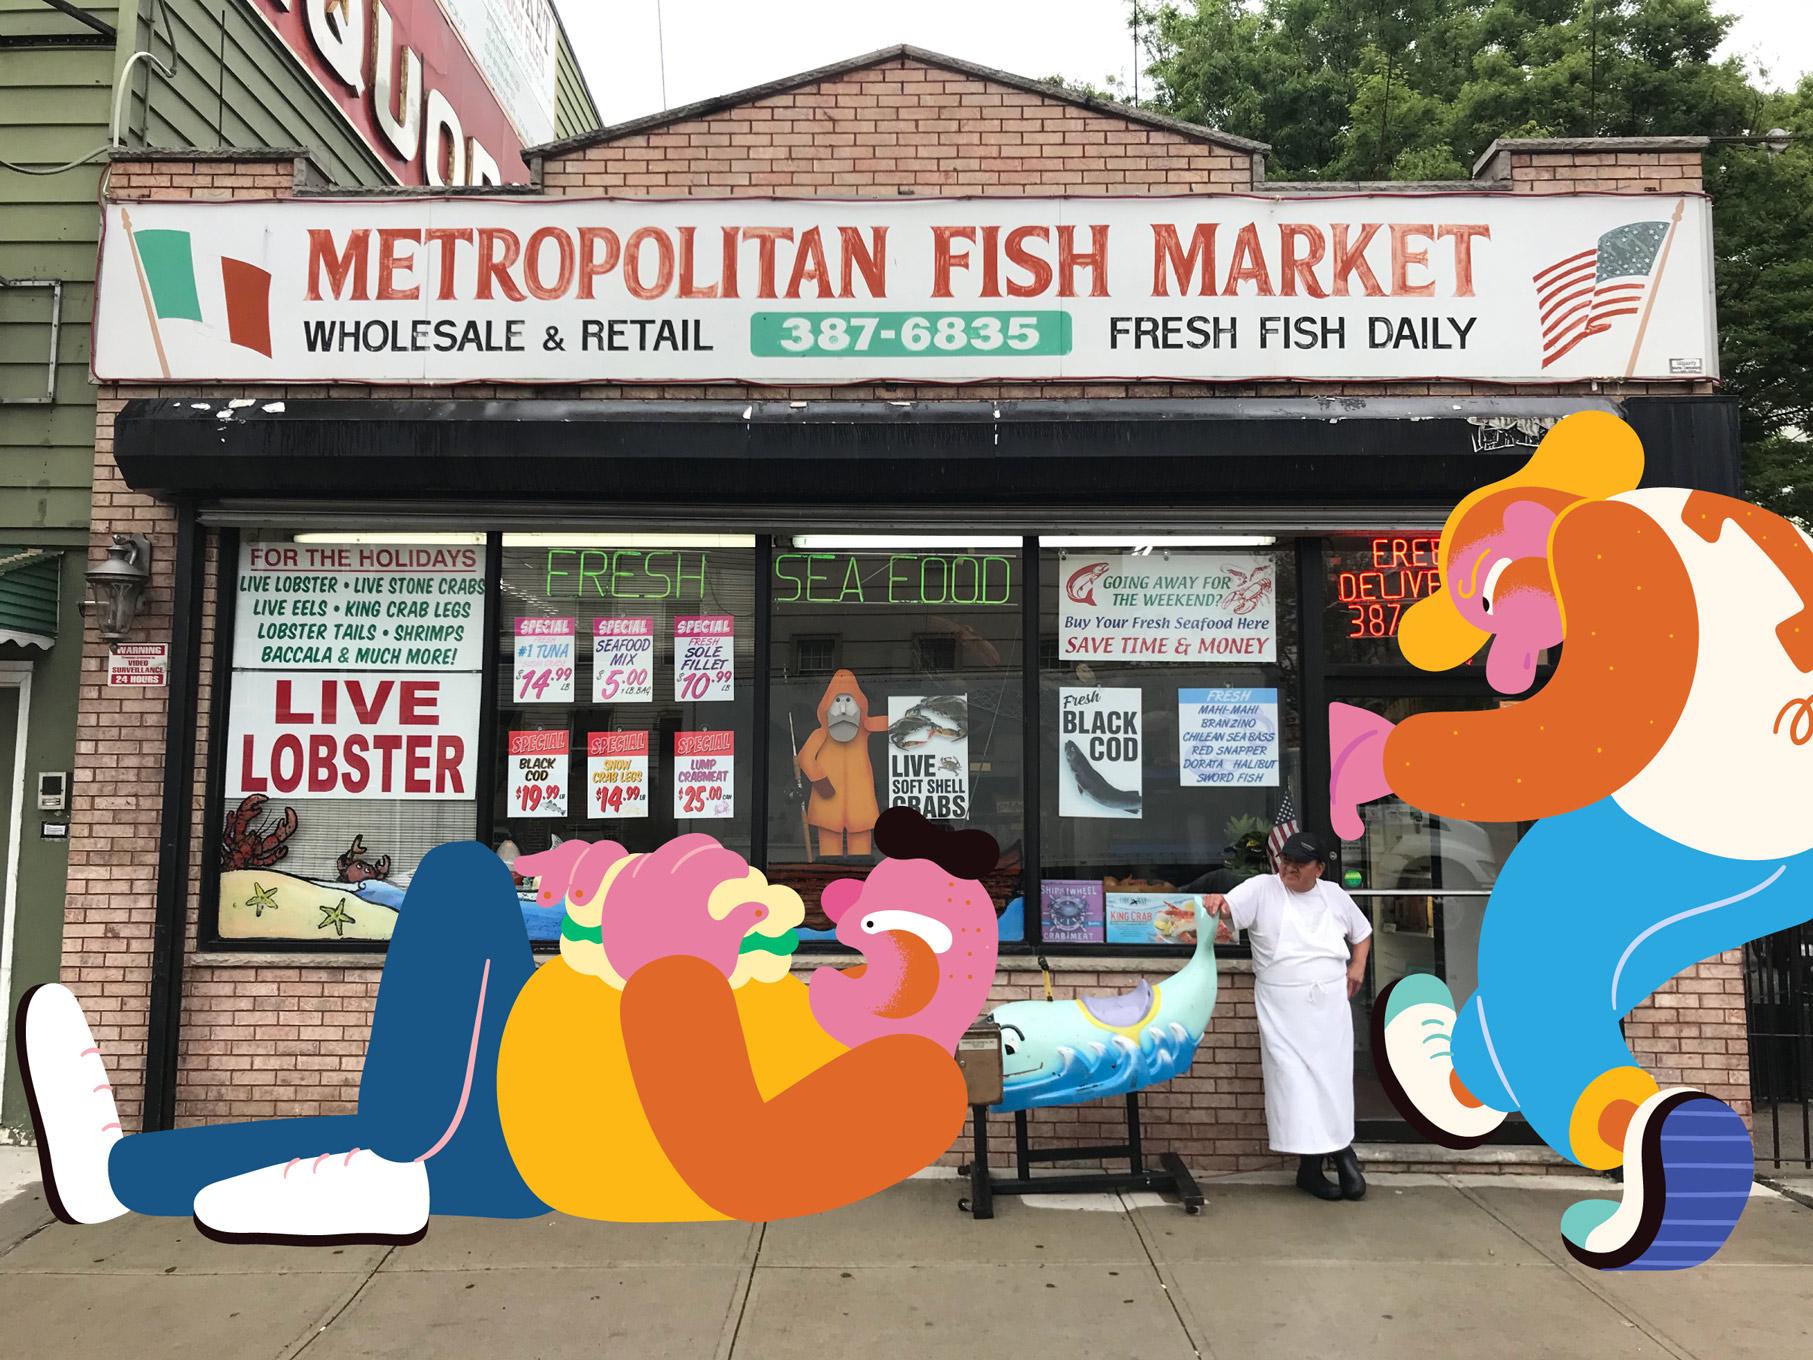 Travel-Illustrations-Fish-Store-Market_LowestRes.jpg